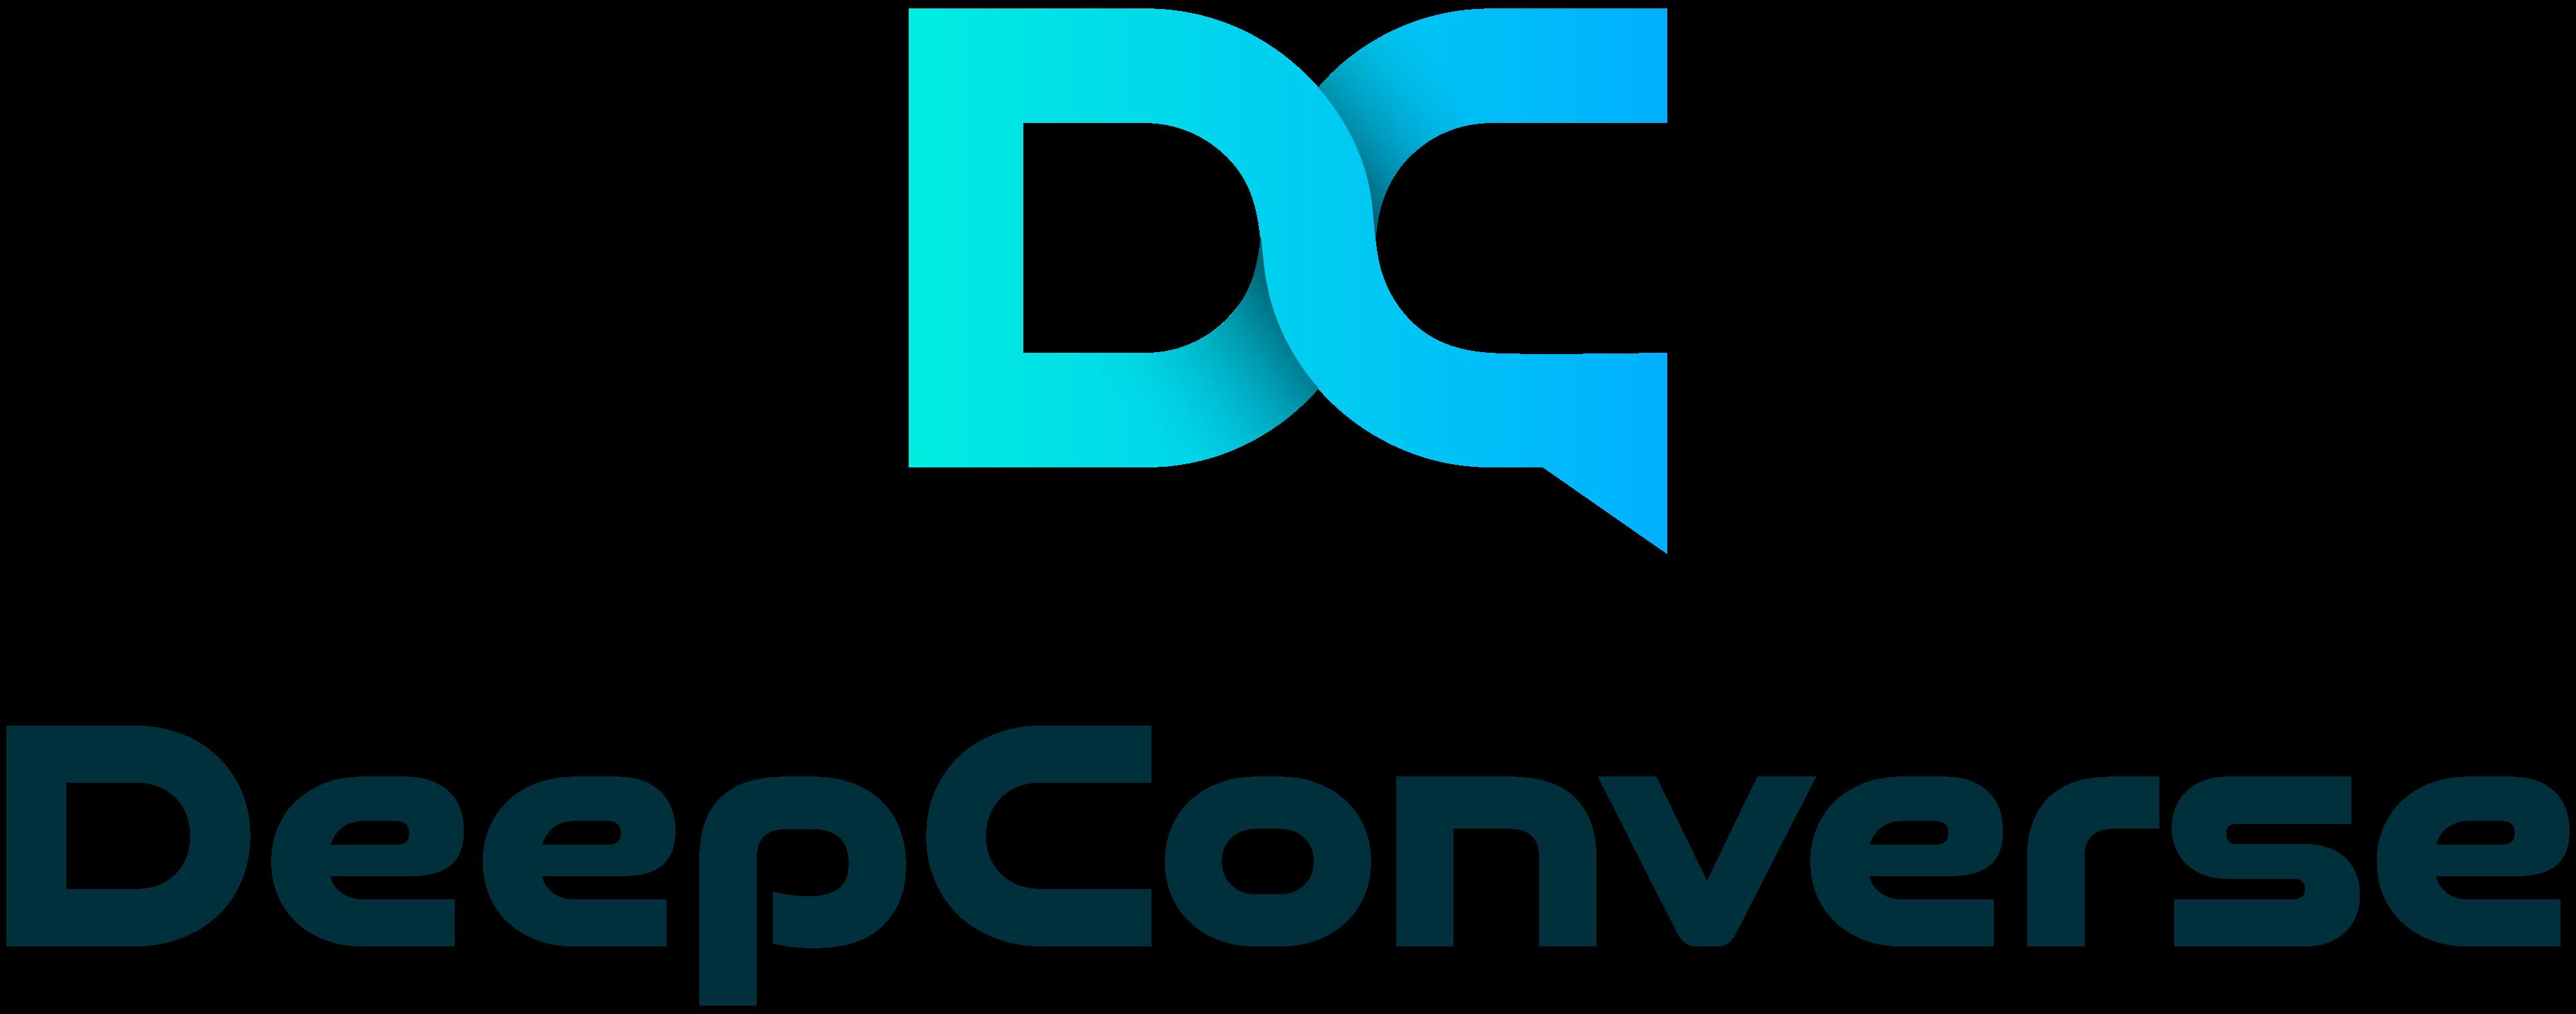 DeepConverse-logo